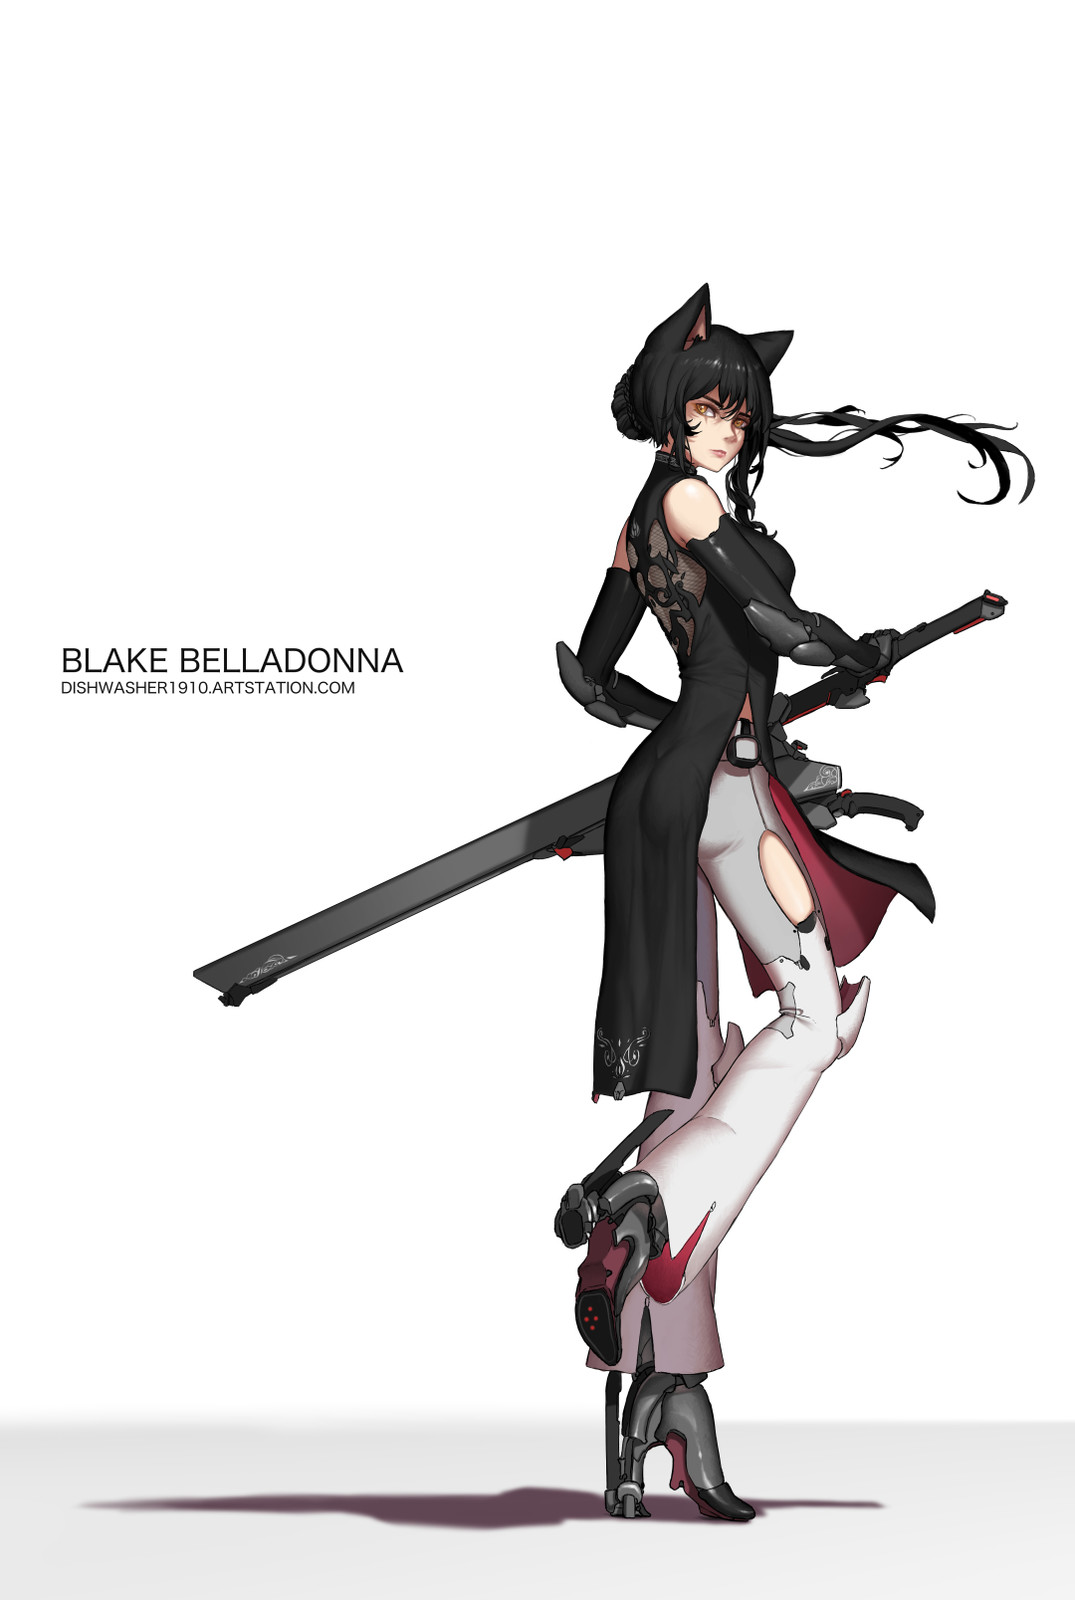 Blake Belladonna - Future 3.0